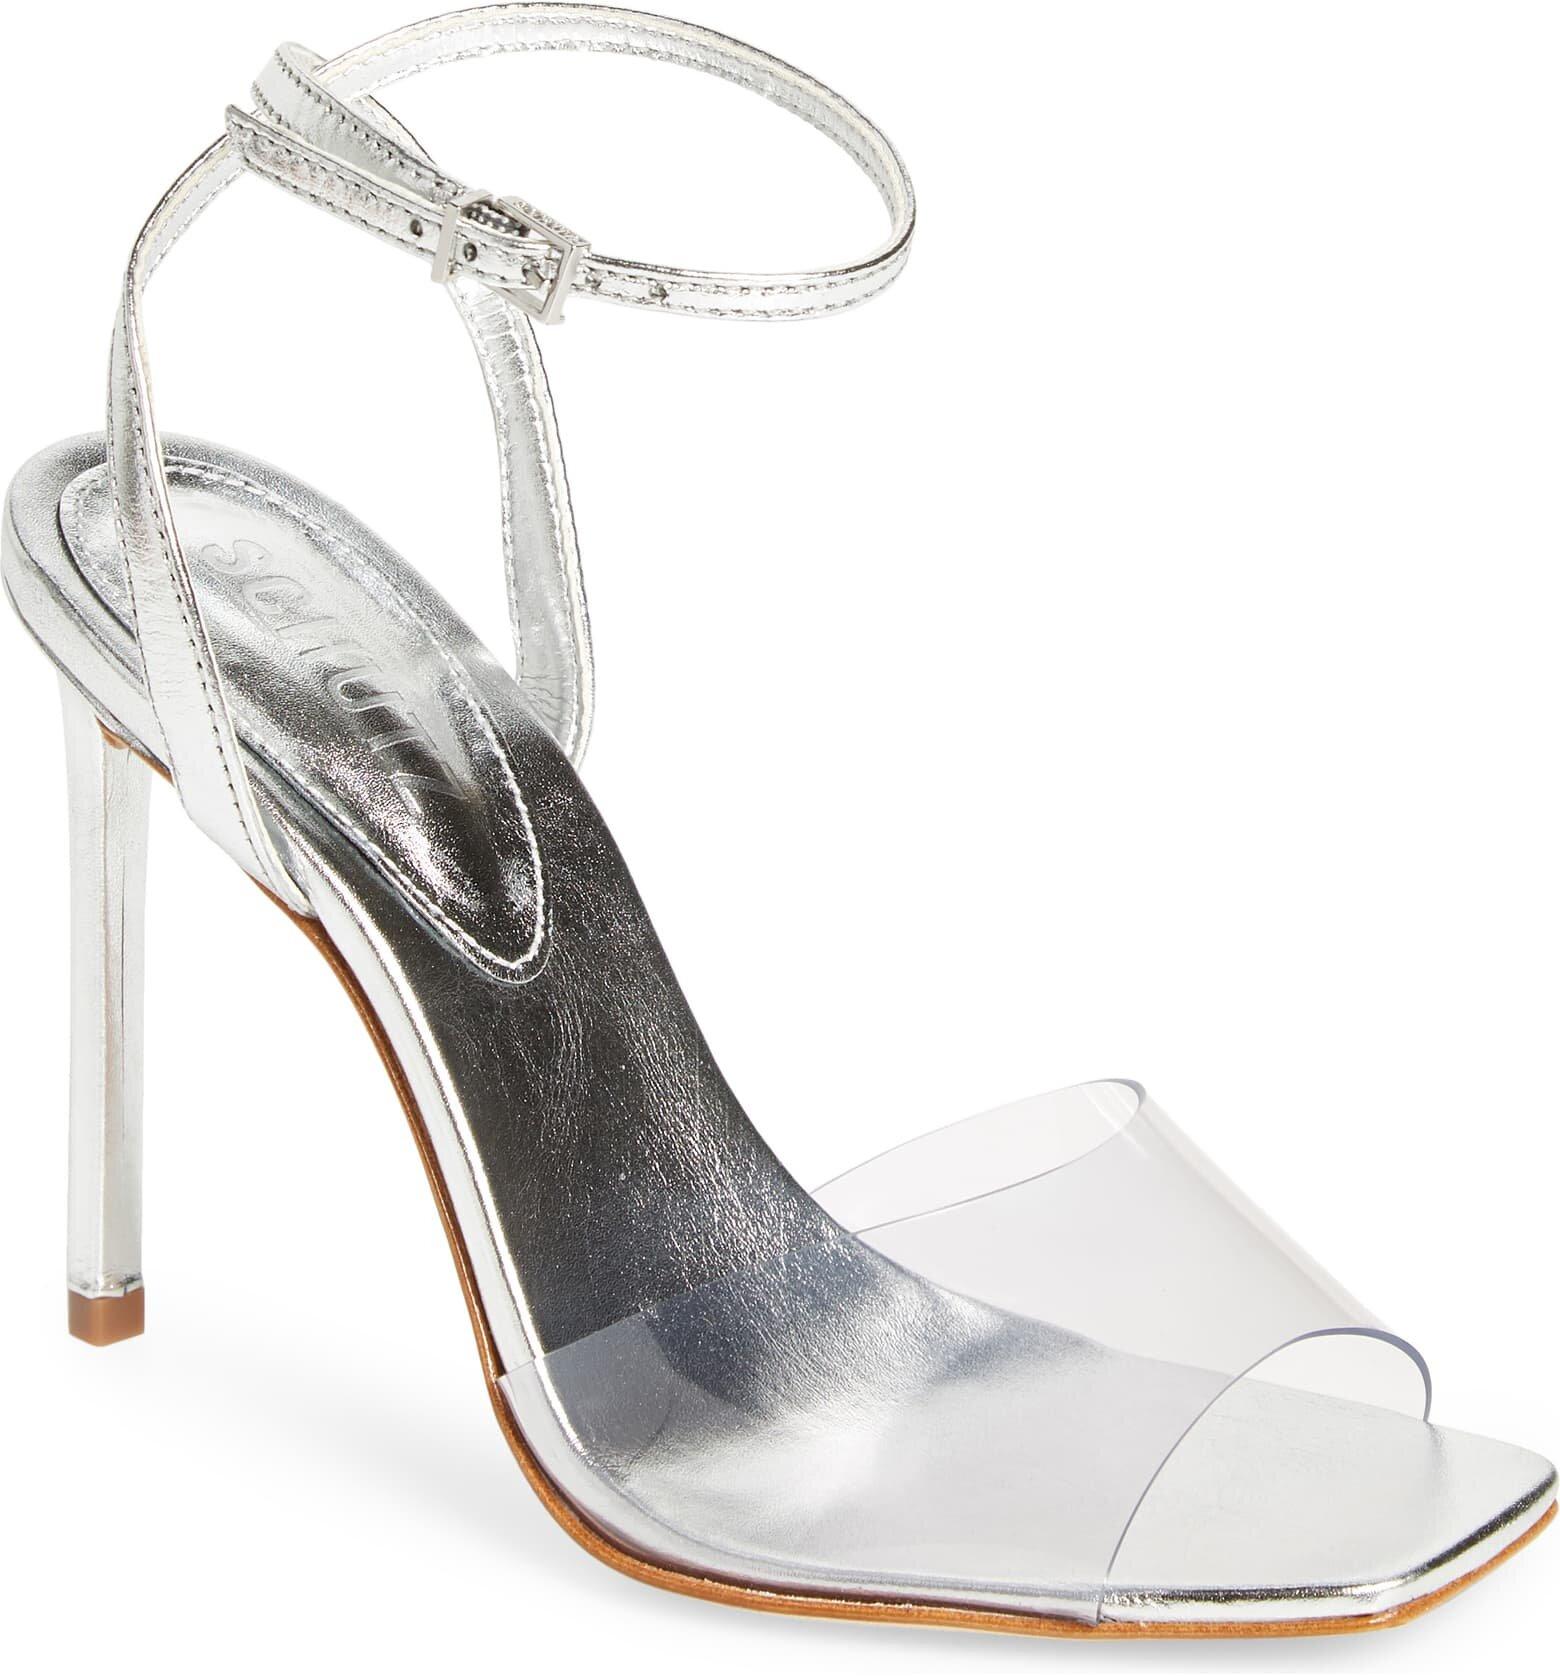 SCHUTZ Jamili Clear Ankle Strap Sandal.jpeg